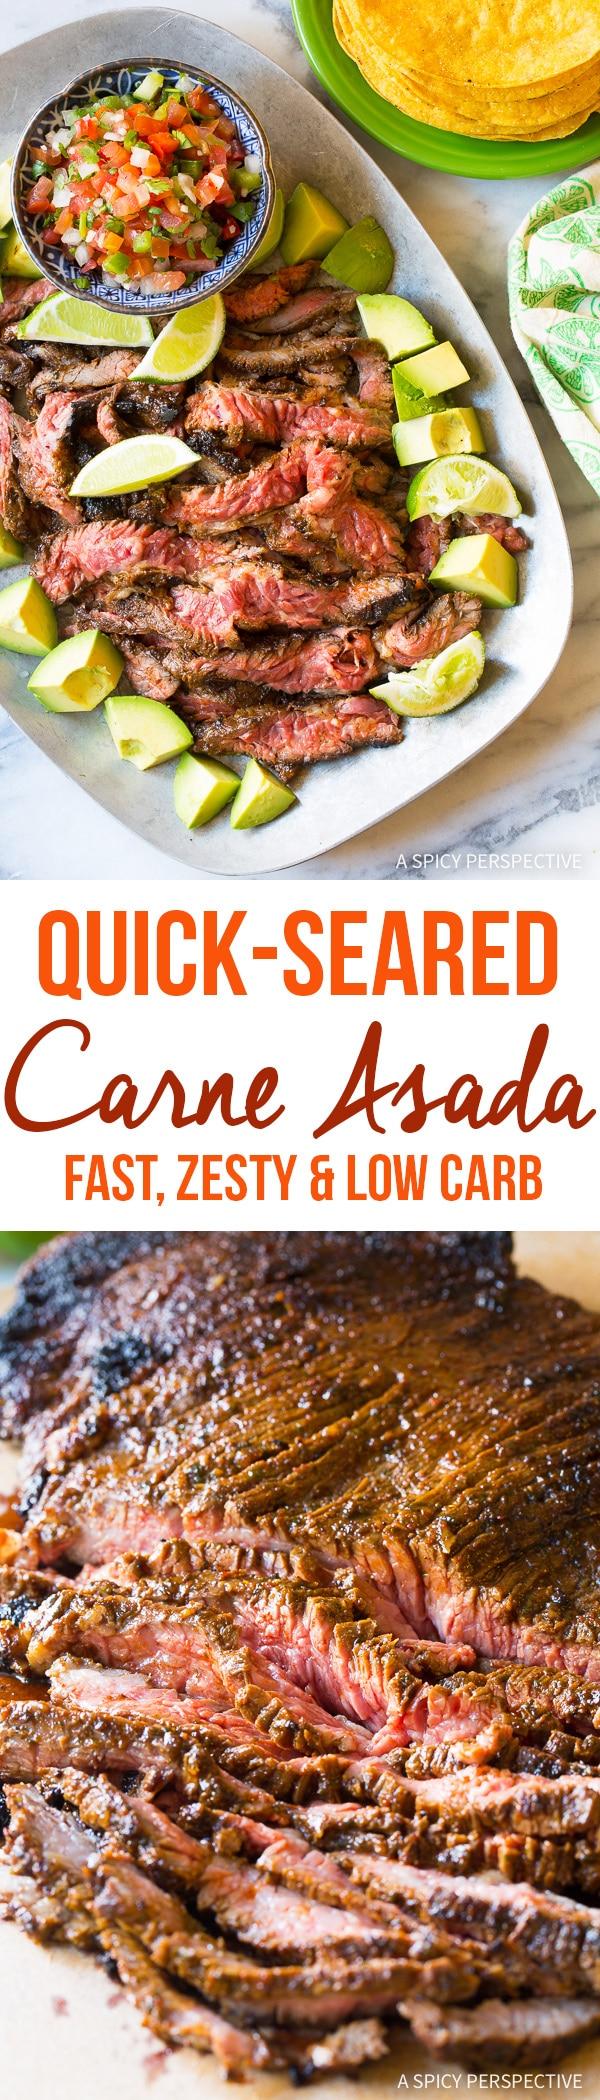 Authentic Quick-Seared Carne Asada Recipe (Low Carb!)